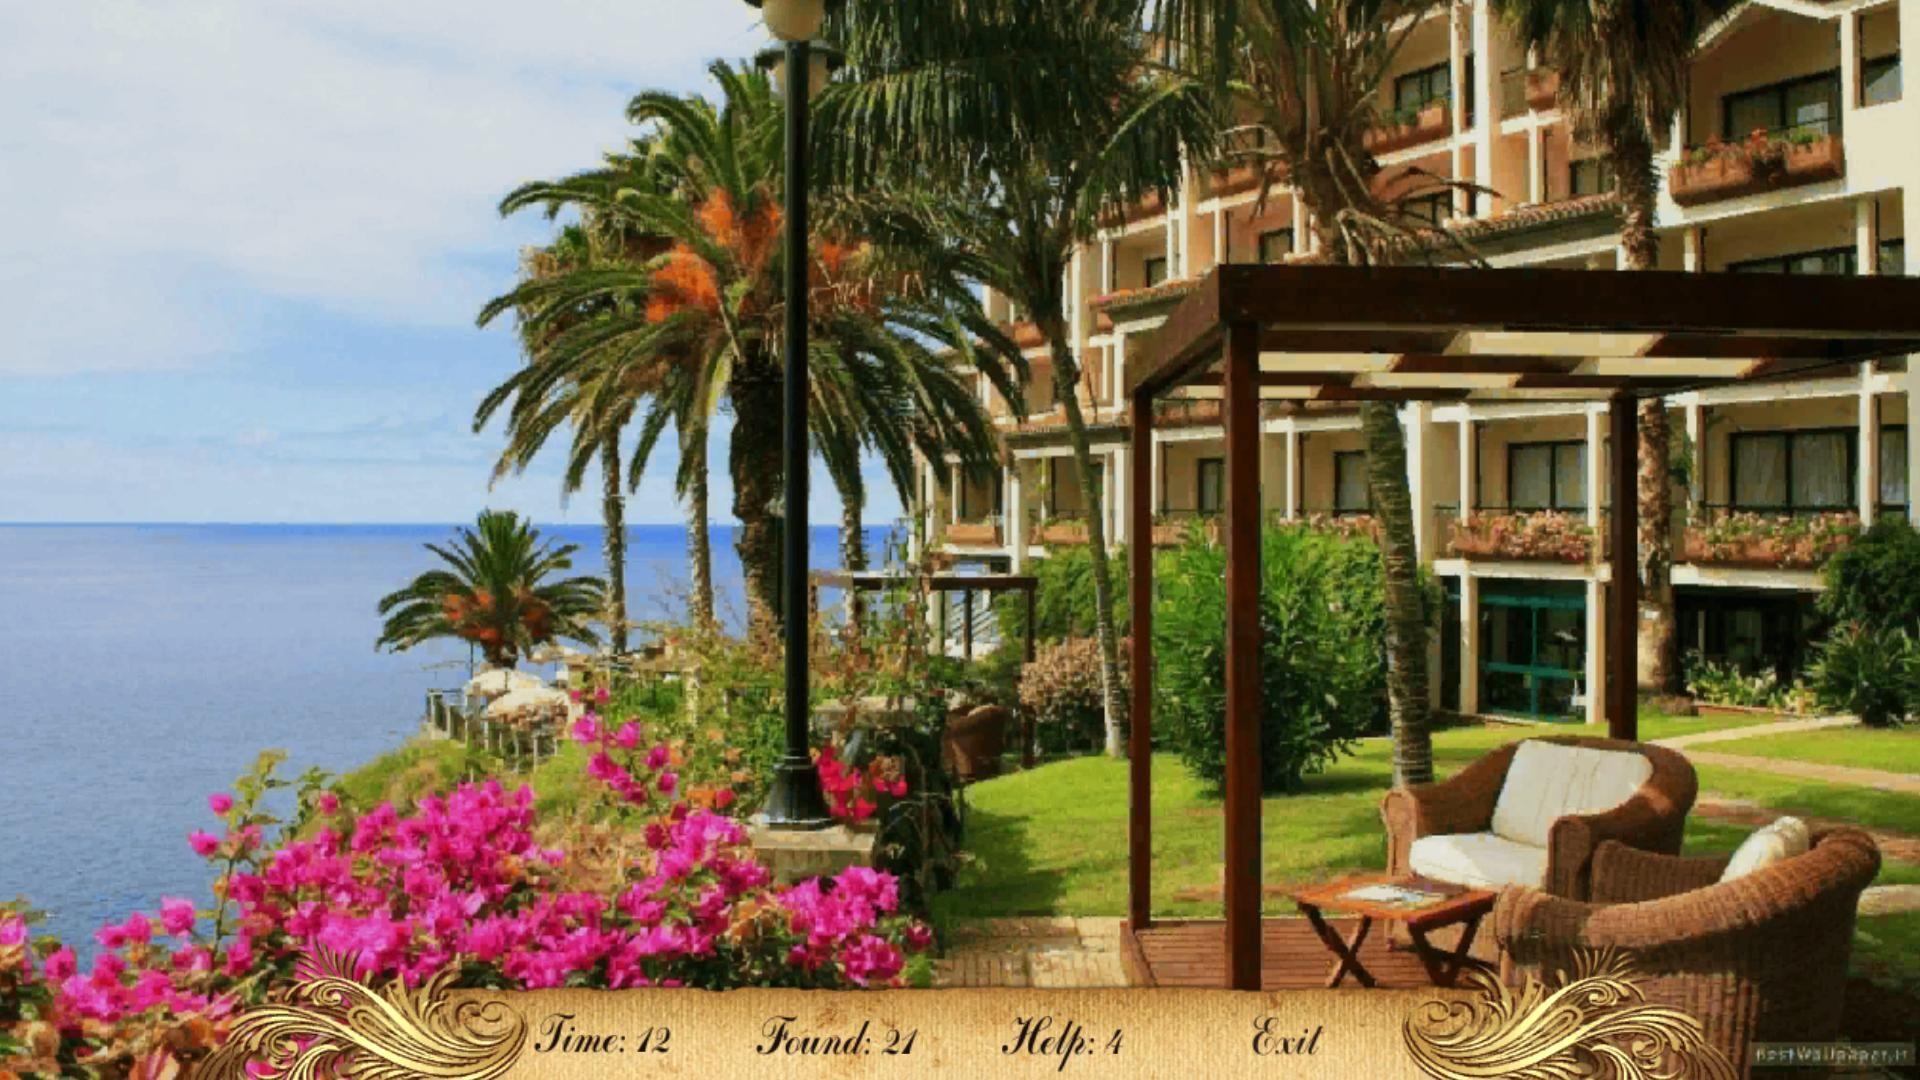 Hotel wallpaper 1080p